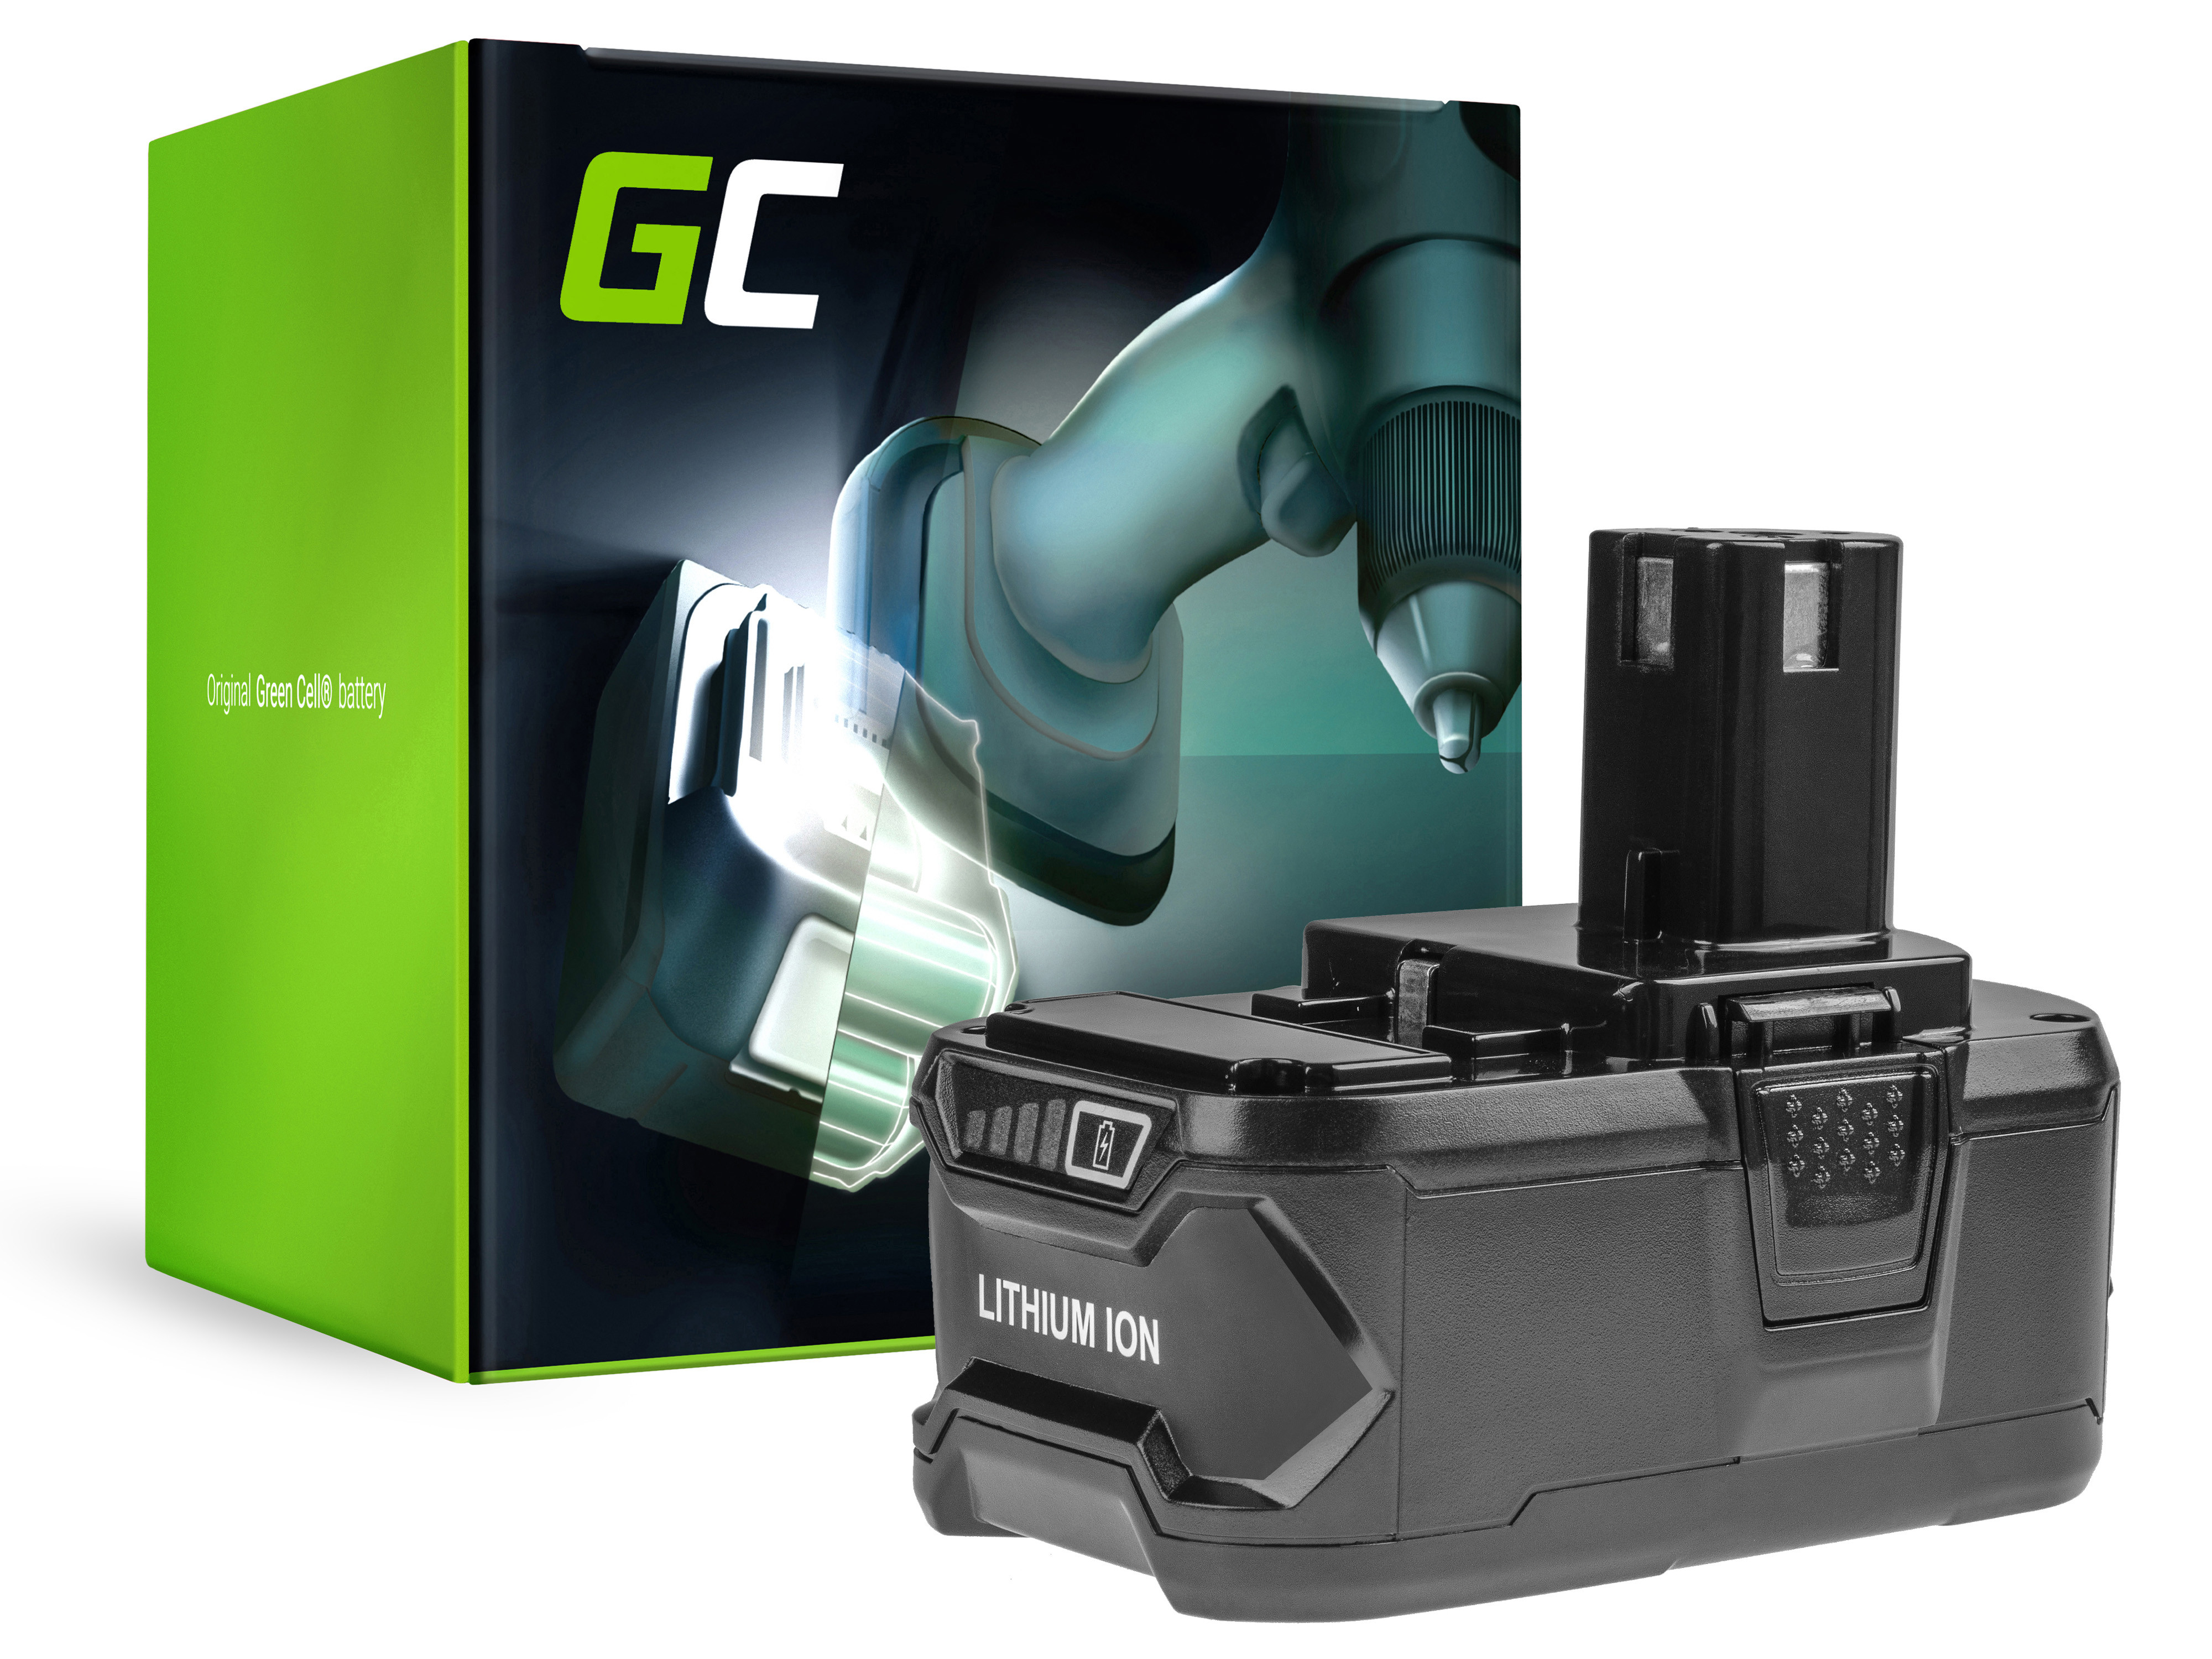 Green Cell PT233 Baterie Ryobi RB18L50 RB18L25 RYOBI R18AG0 R18JS0 R18PDBL RCD18022L RID1801M RMT1801M 6000mAh Li-ion - neoriginální